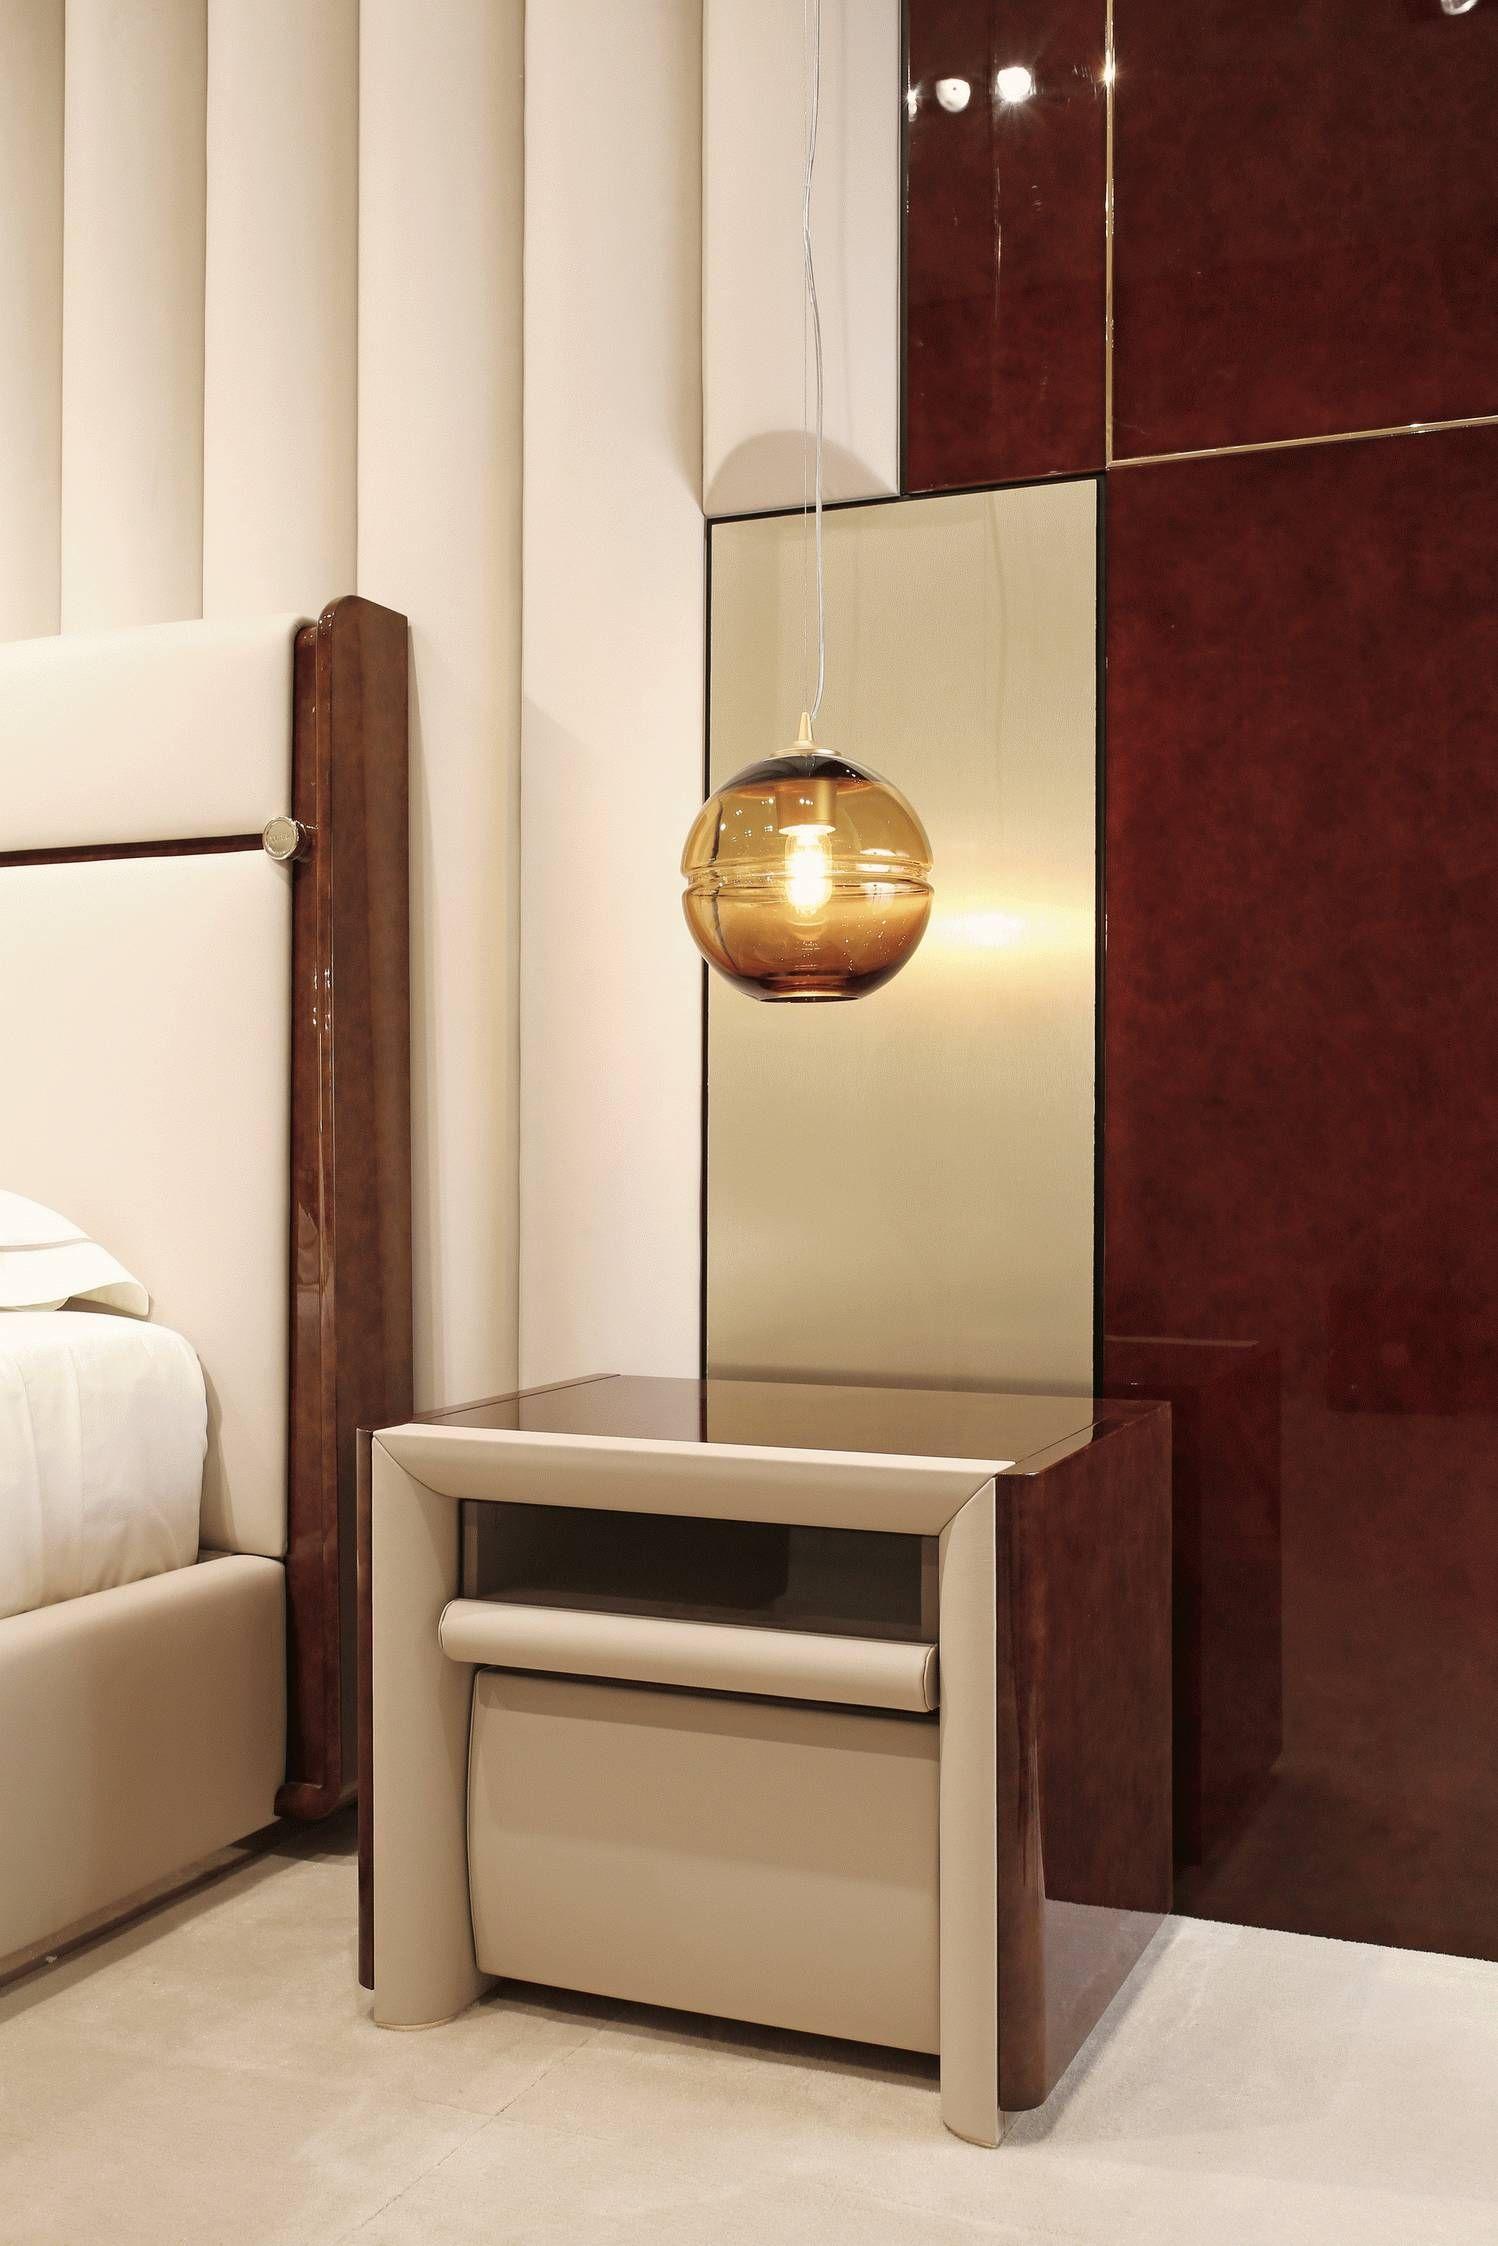 Madison Bedroom wwwit Italian luxury night table